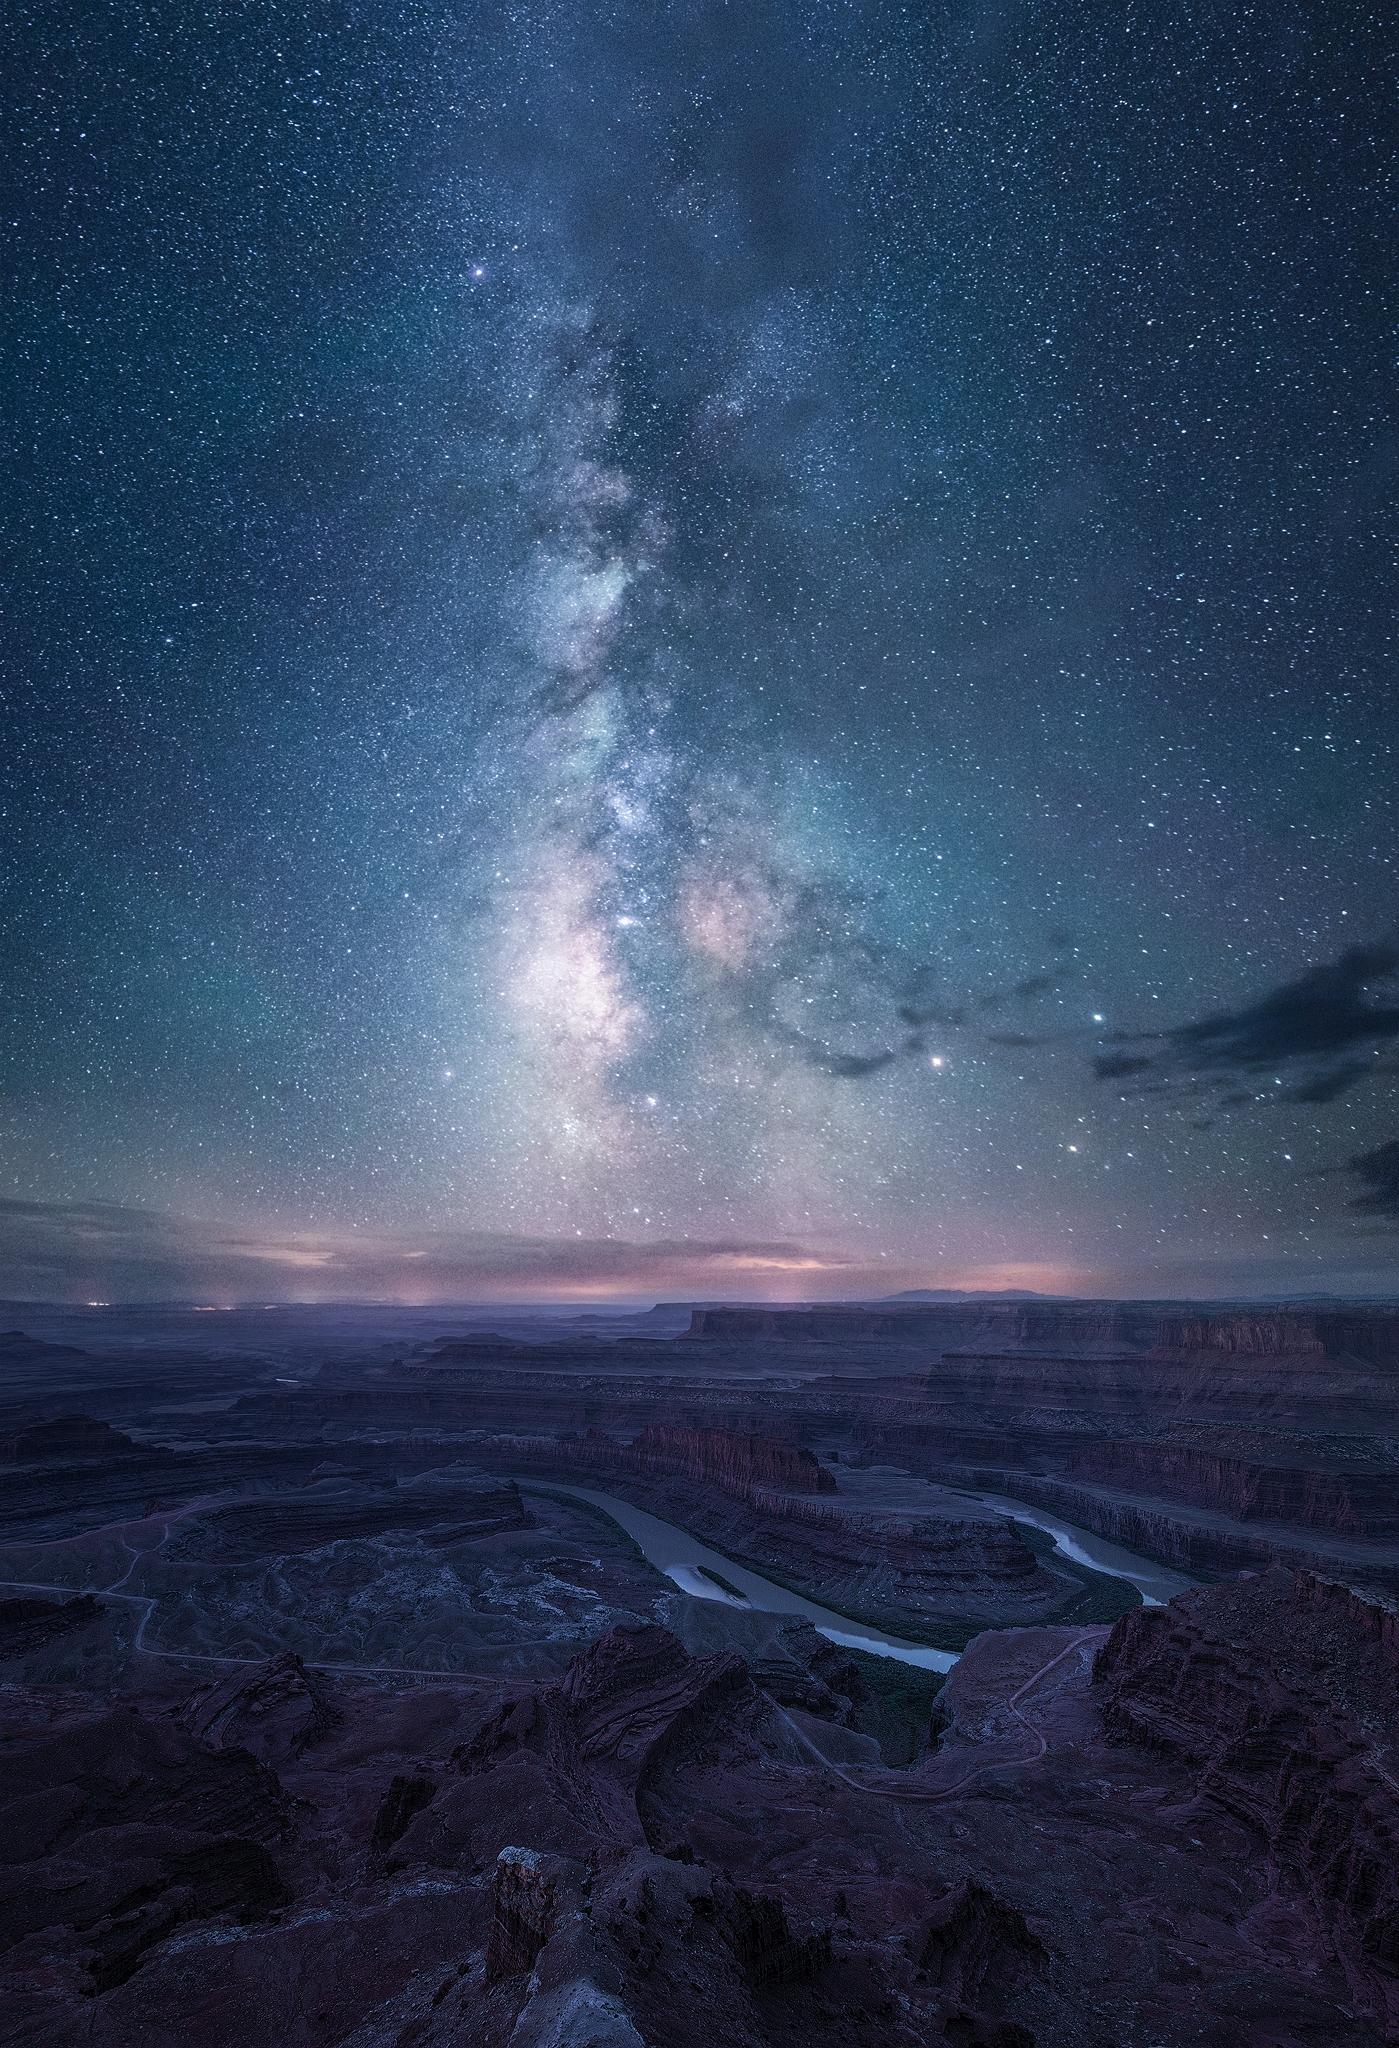 star-filled evening Dead Horse  - skyfolk | ello